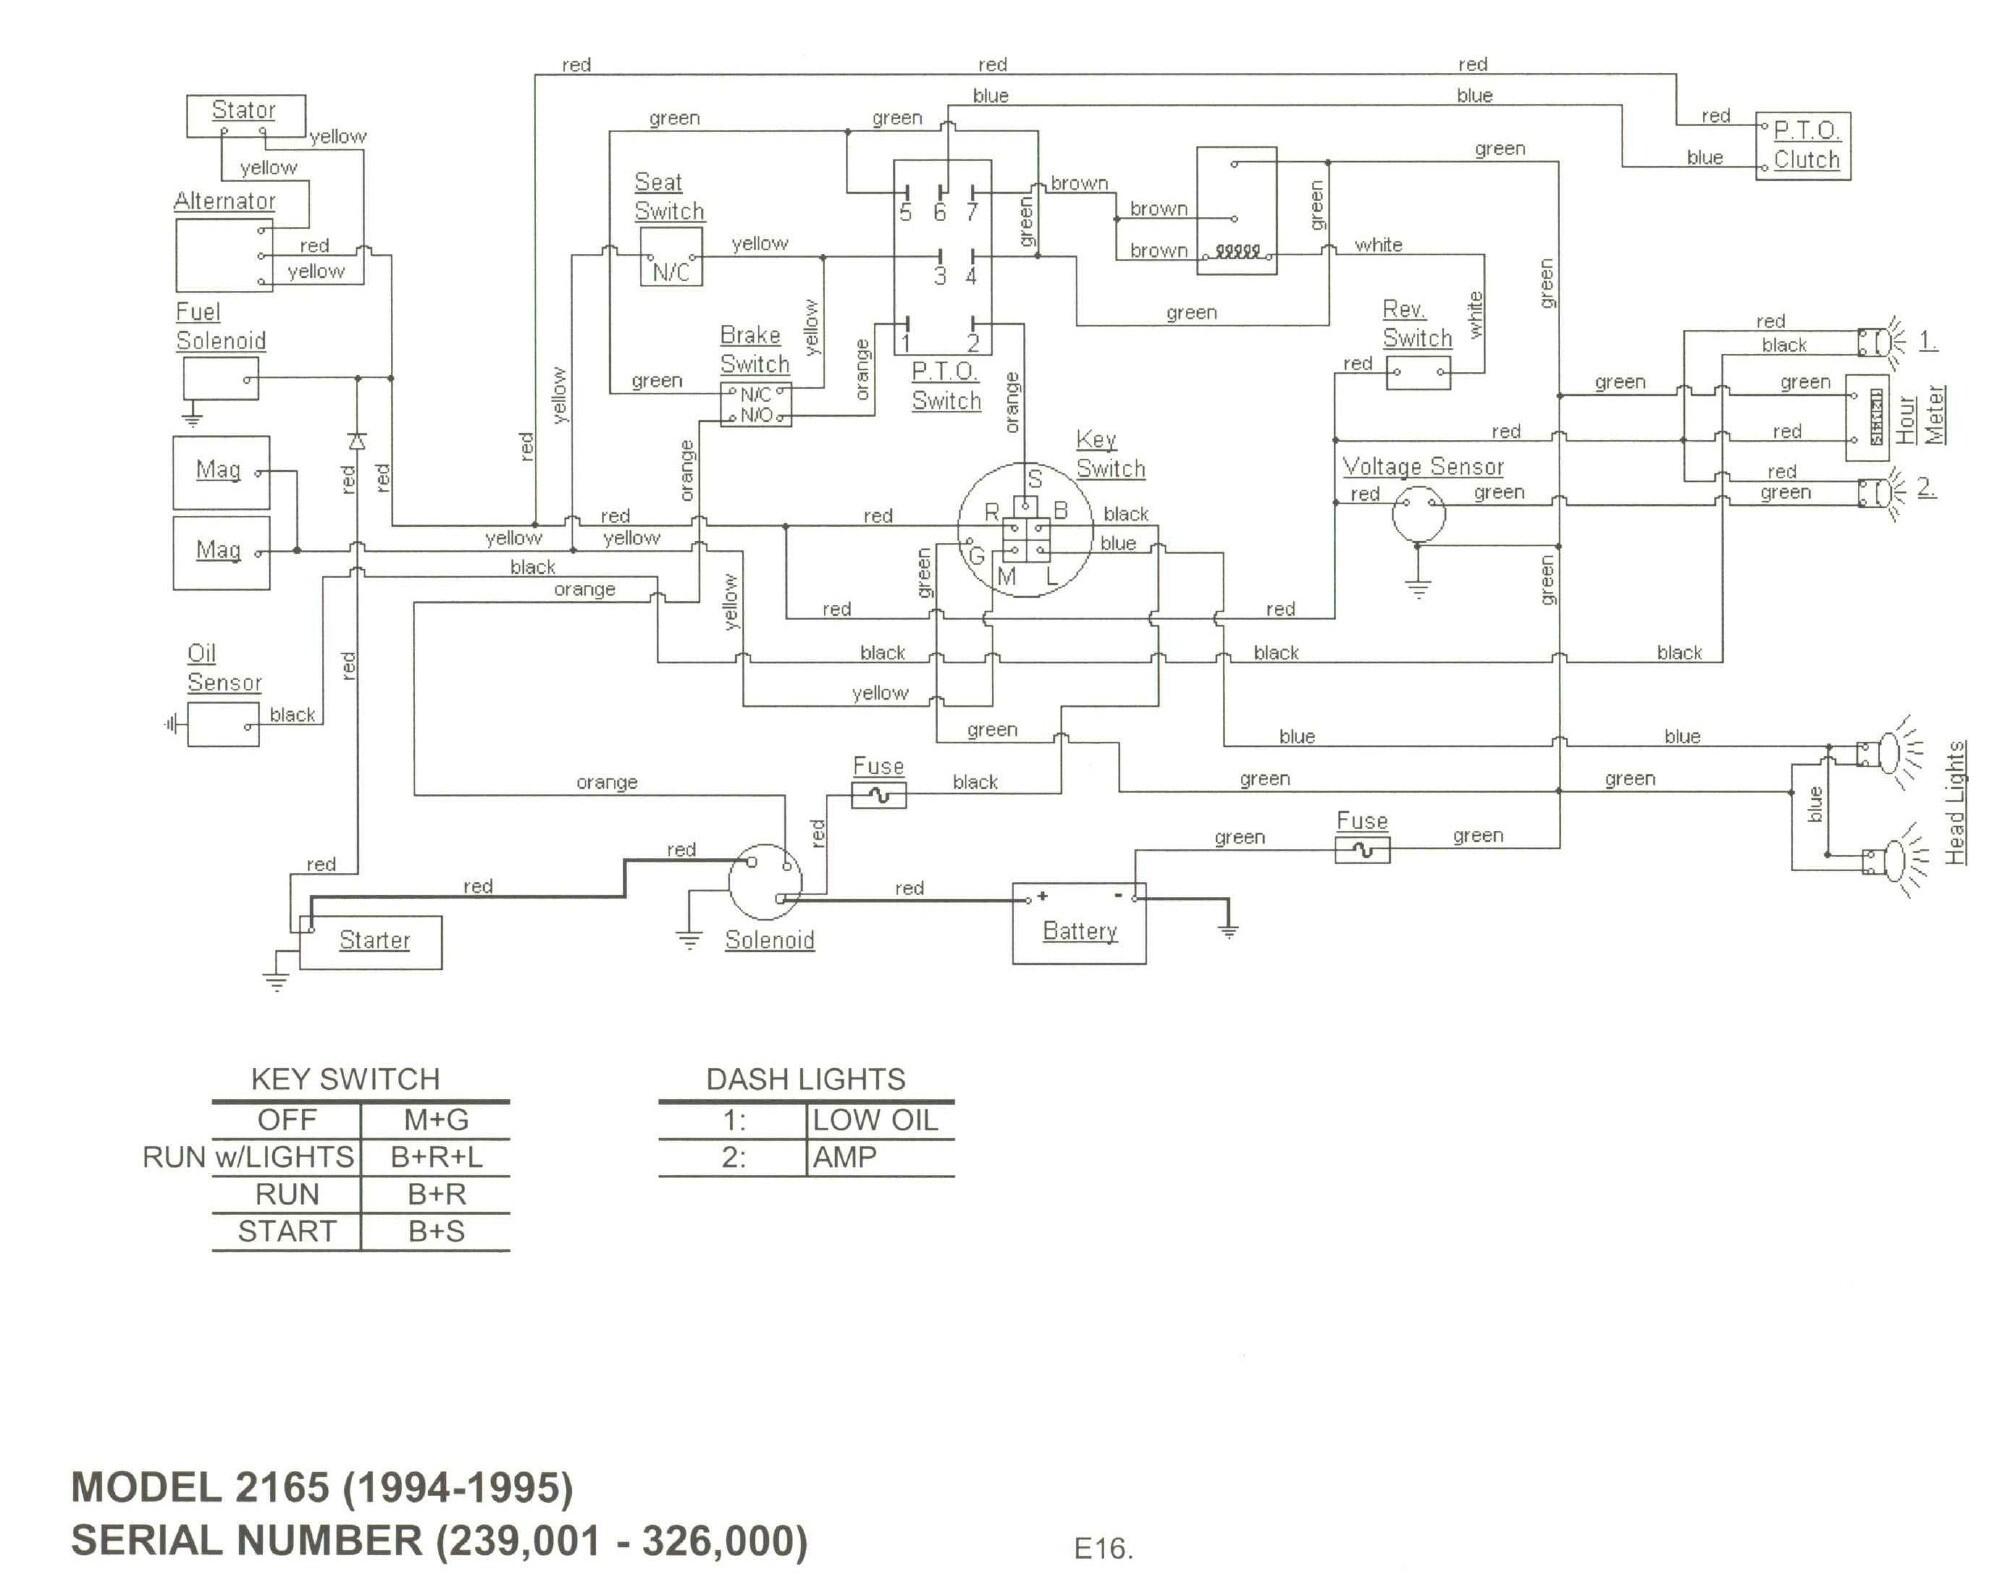 Cub Cadet Hds 2185 Wiring Diagram Hds Pto Clutch Won 11 5 - Pto Switch Wiring Diagram